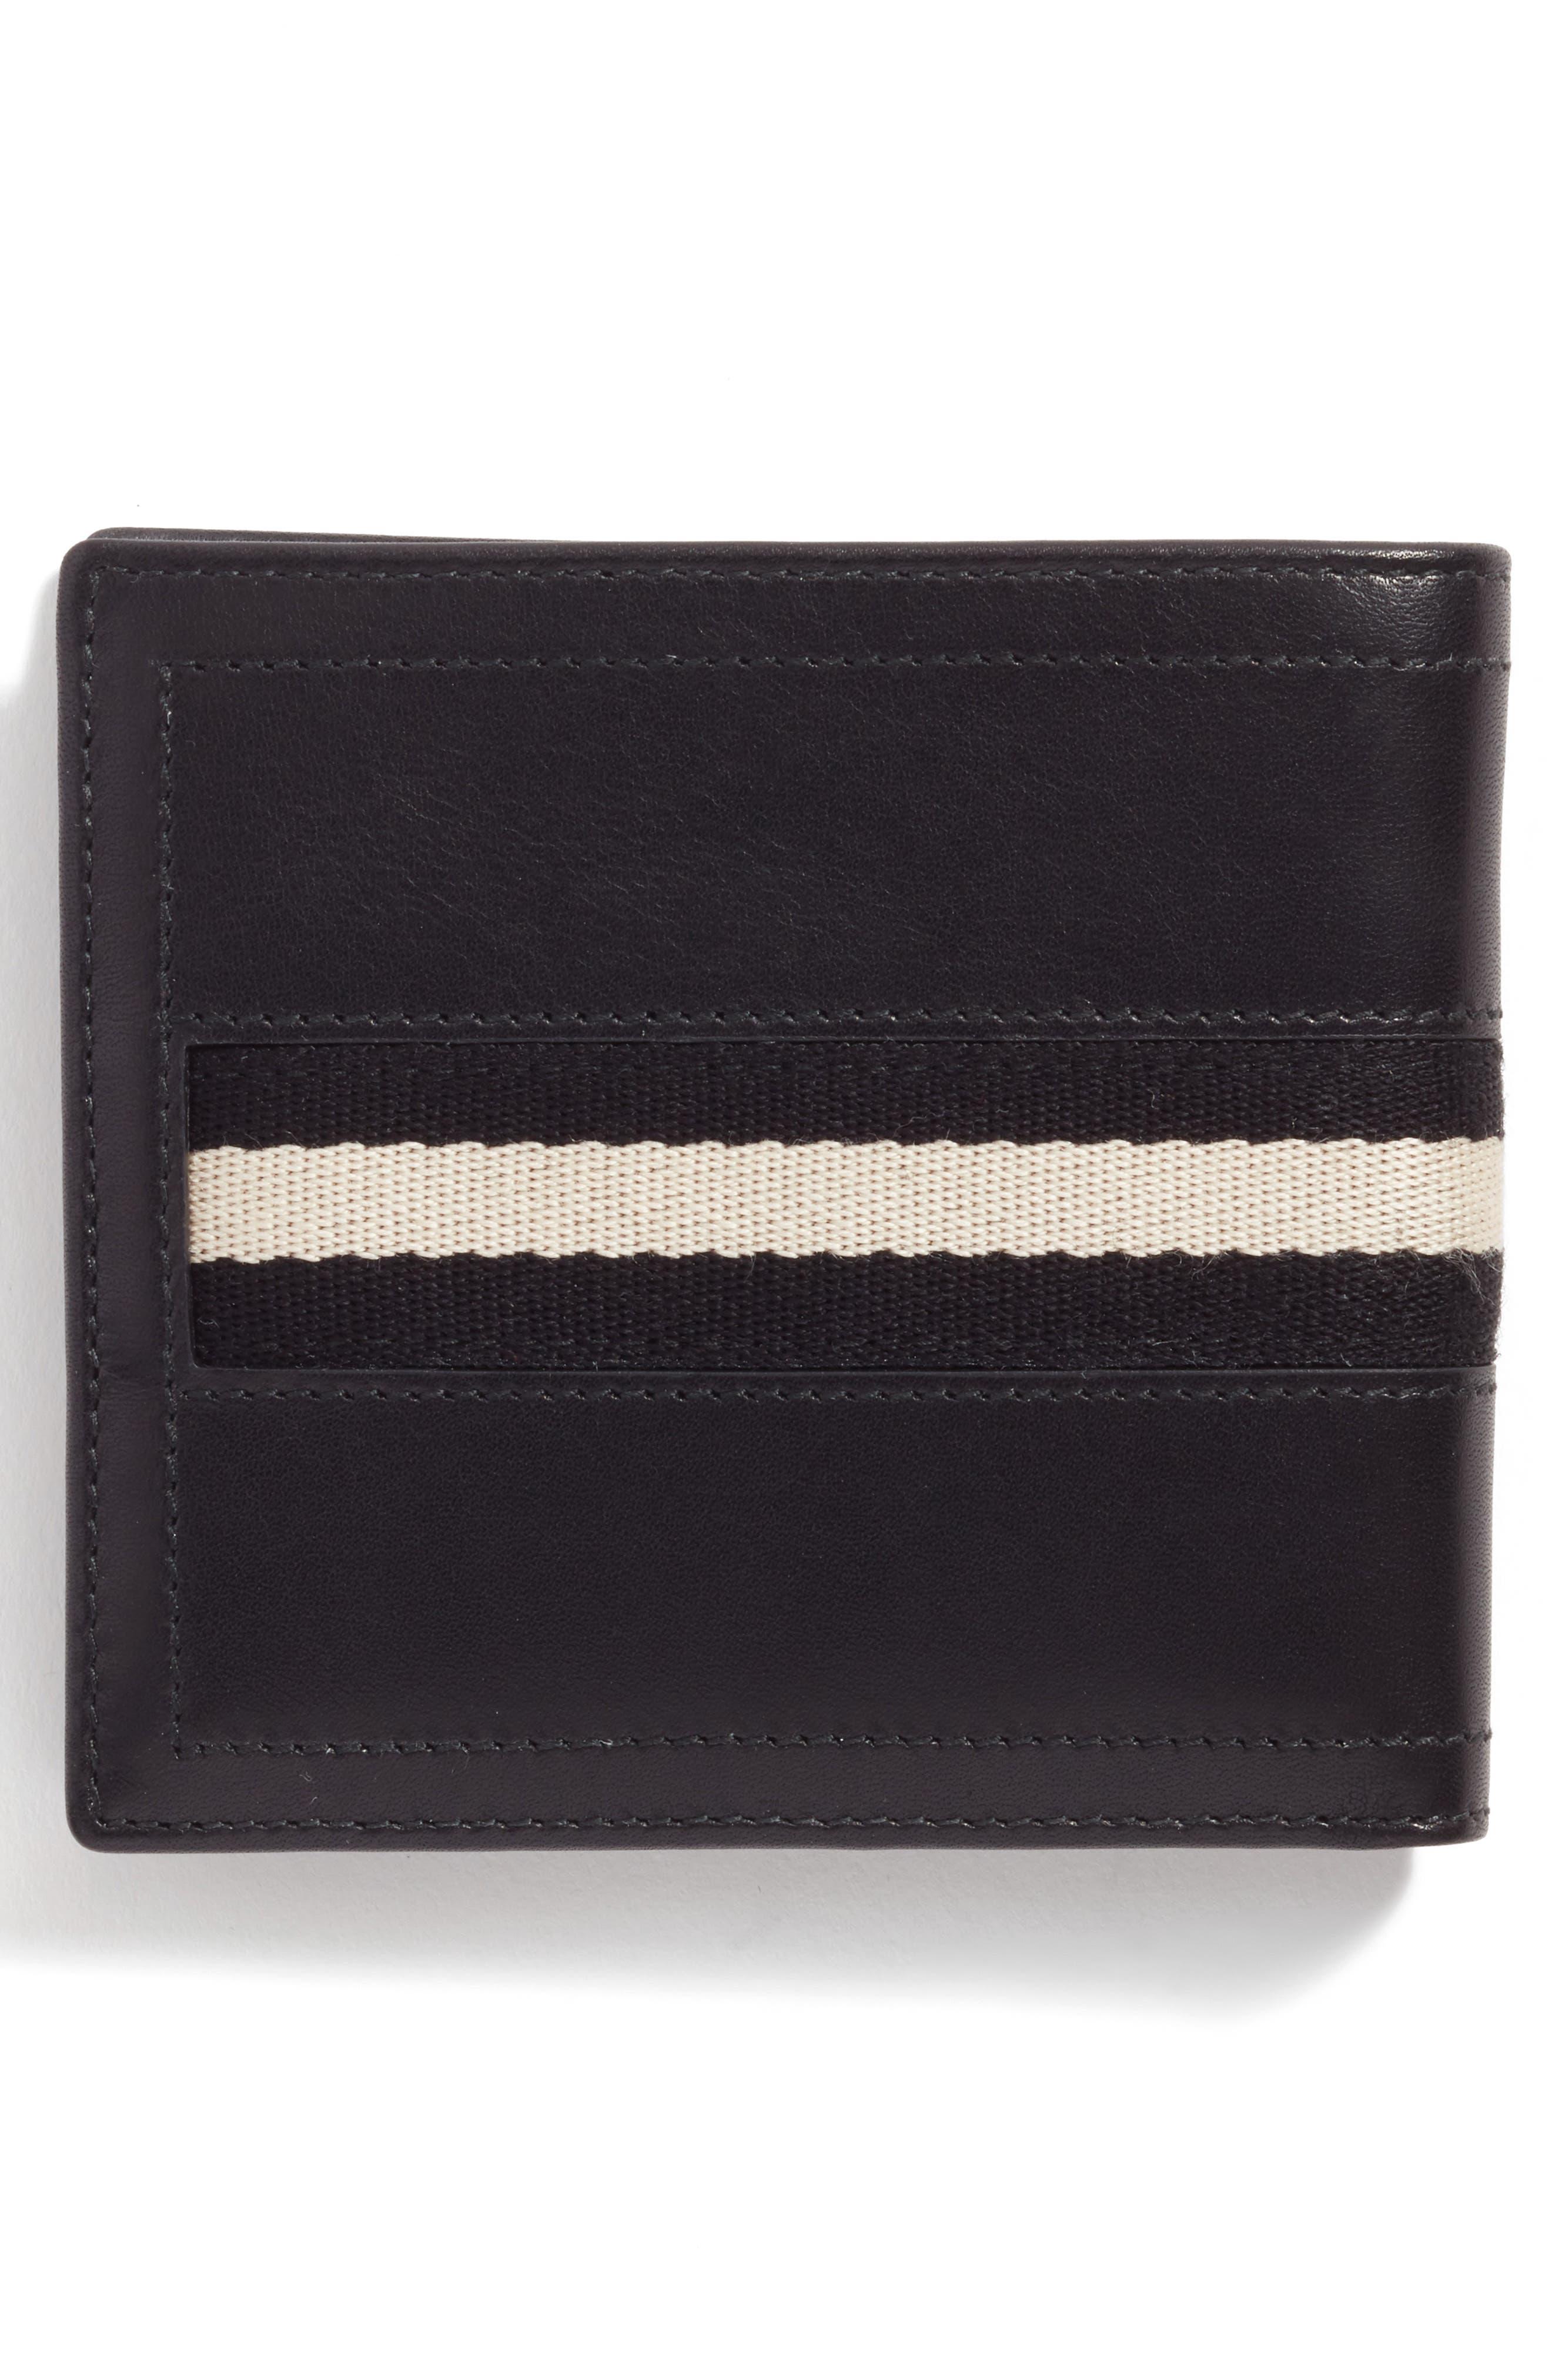 Leather Wallet and Belt Gift Set,                             Alternate thumbnail 3, color,                             Black